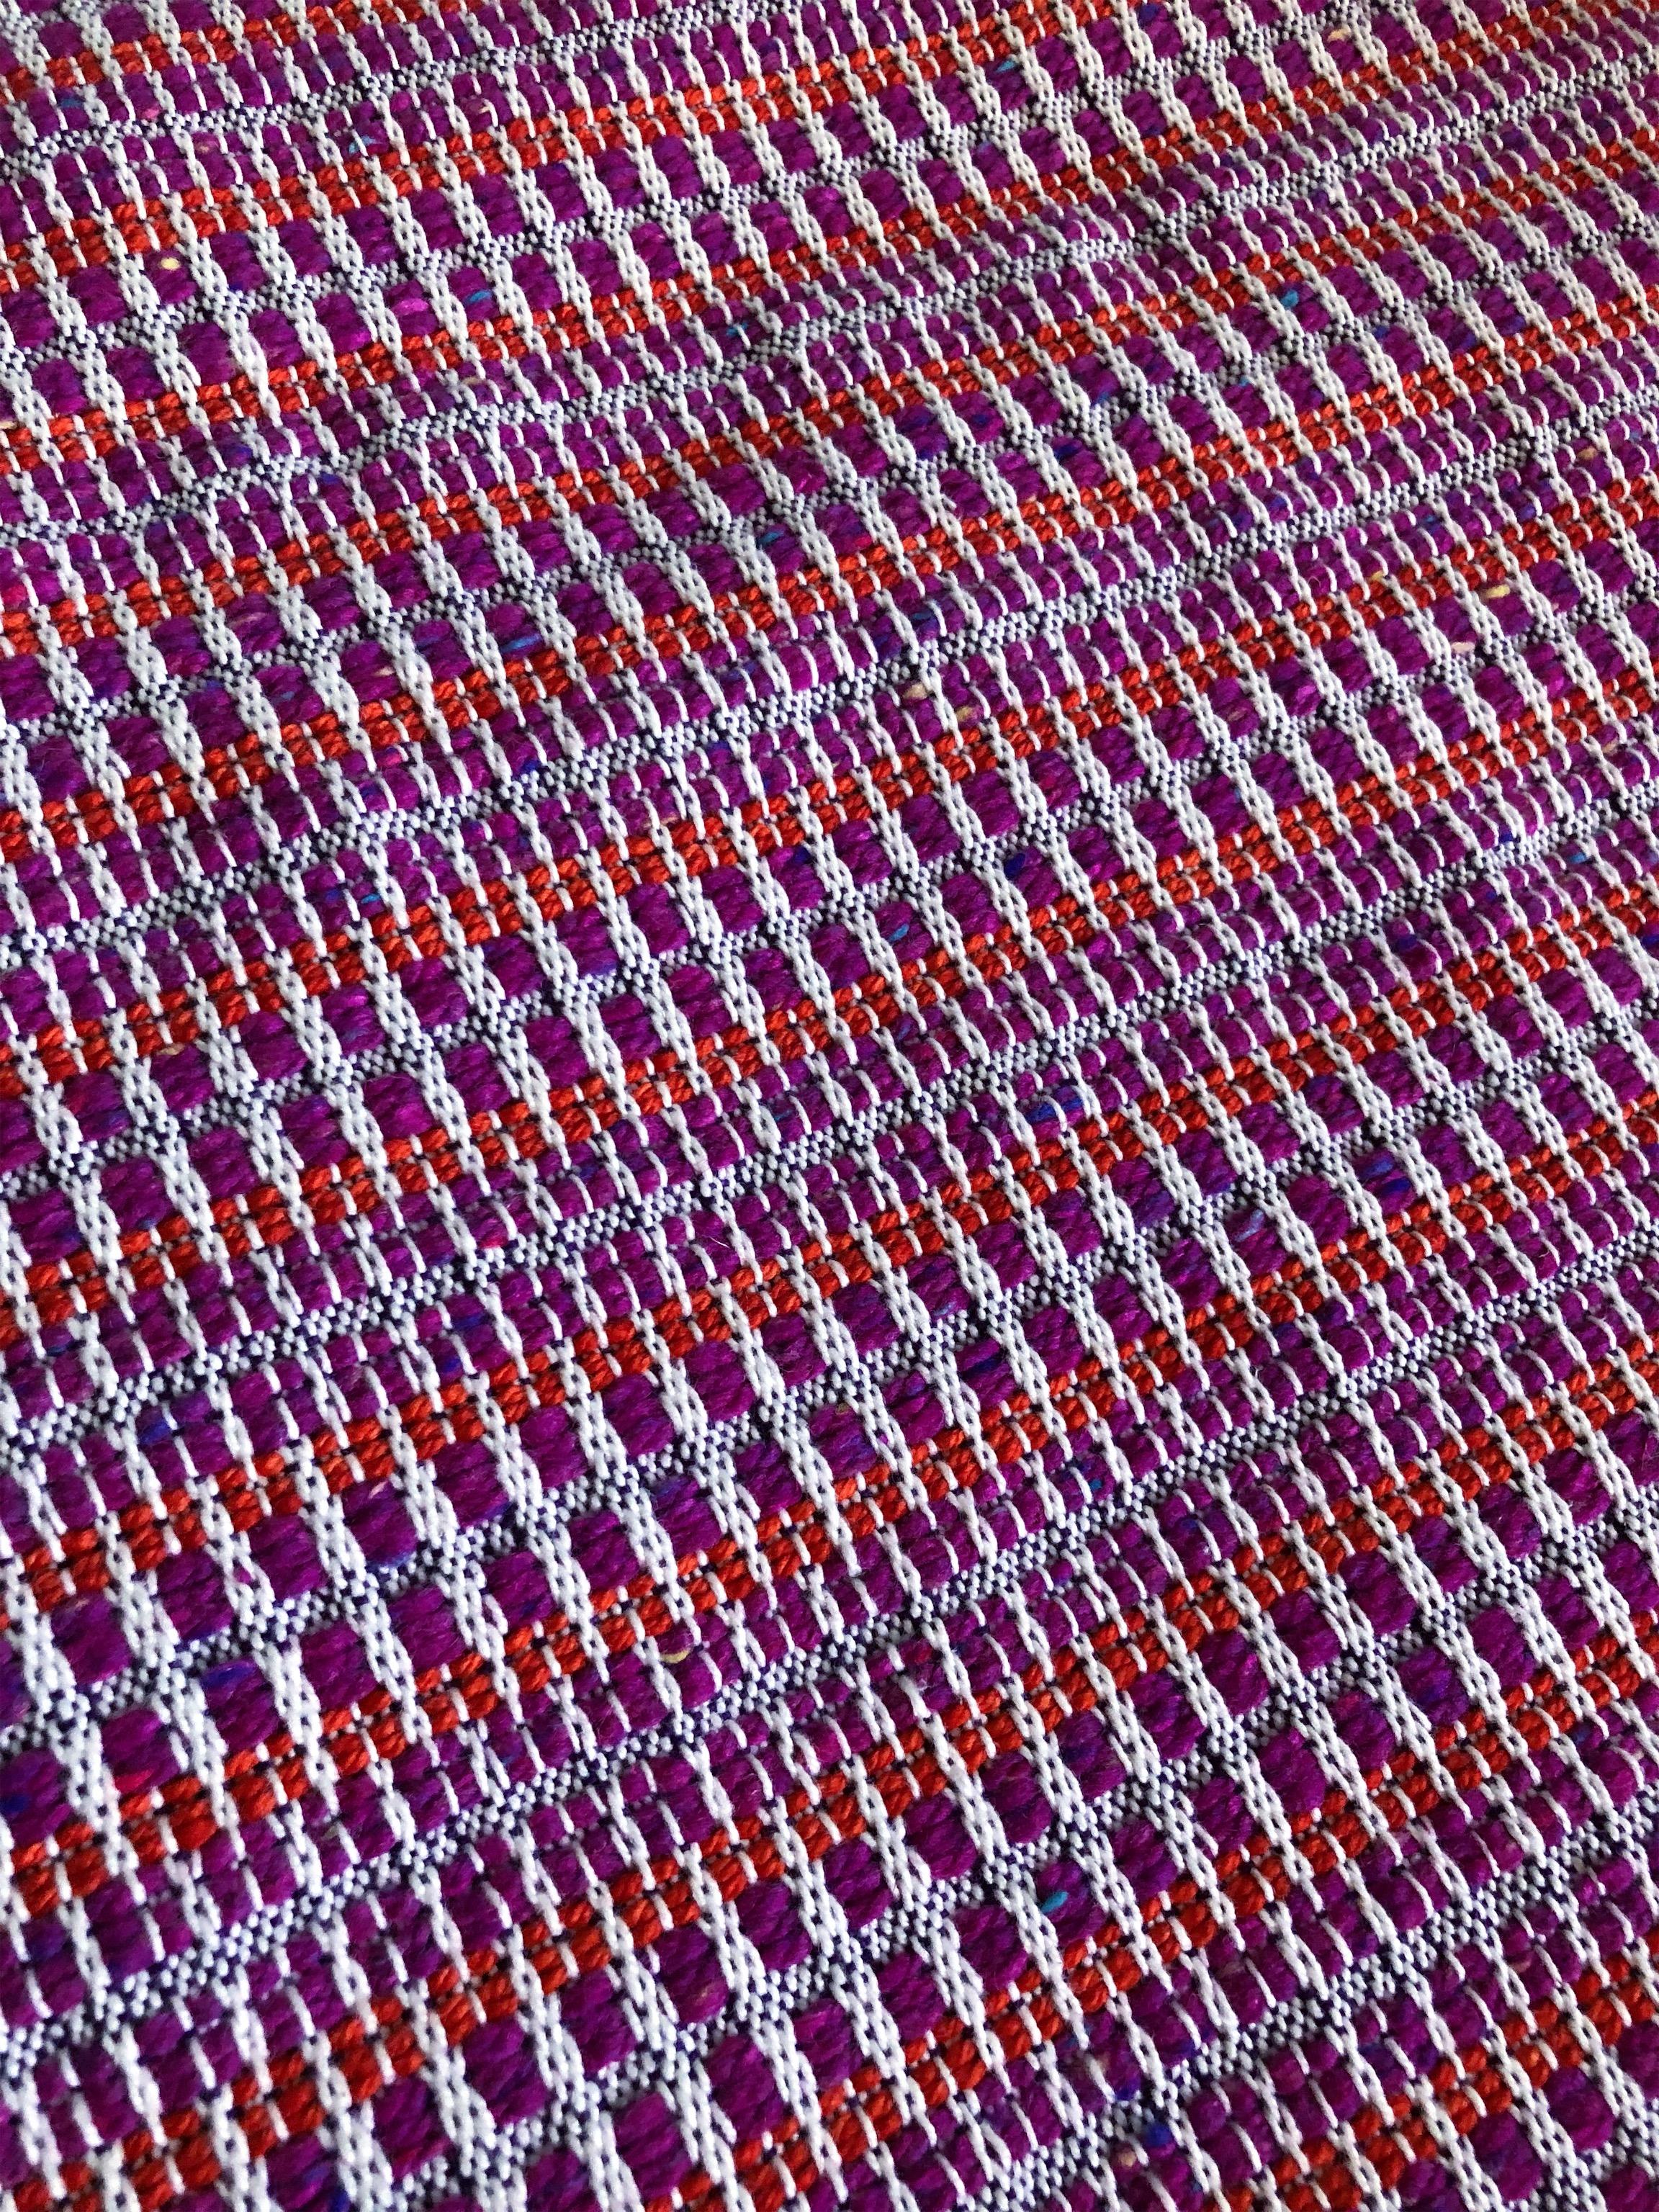 Yarn & Whiskey  - Tammi Williams